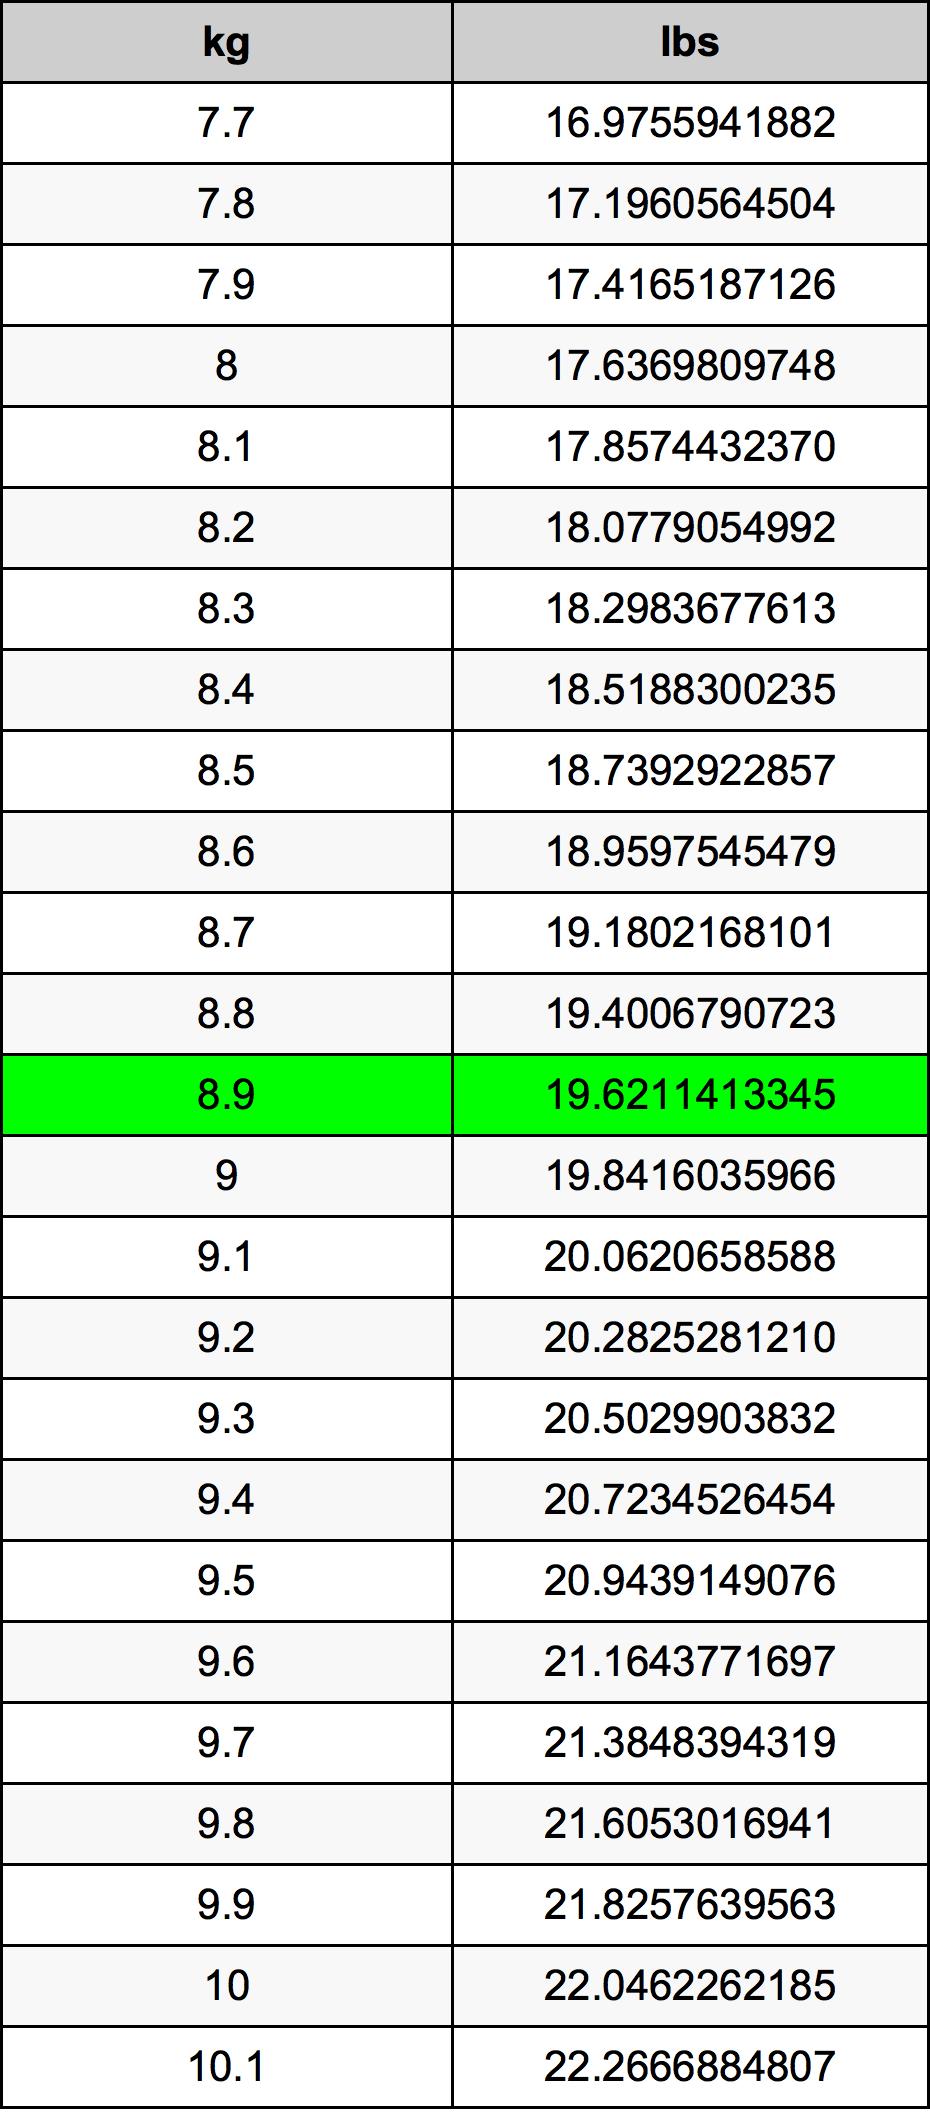 8.9 Kilogram konversi tabel